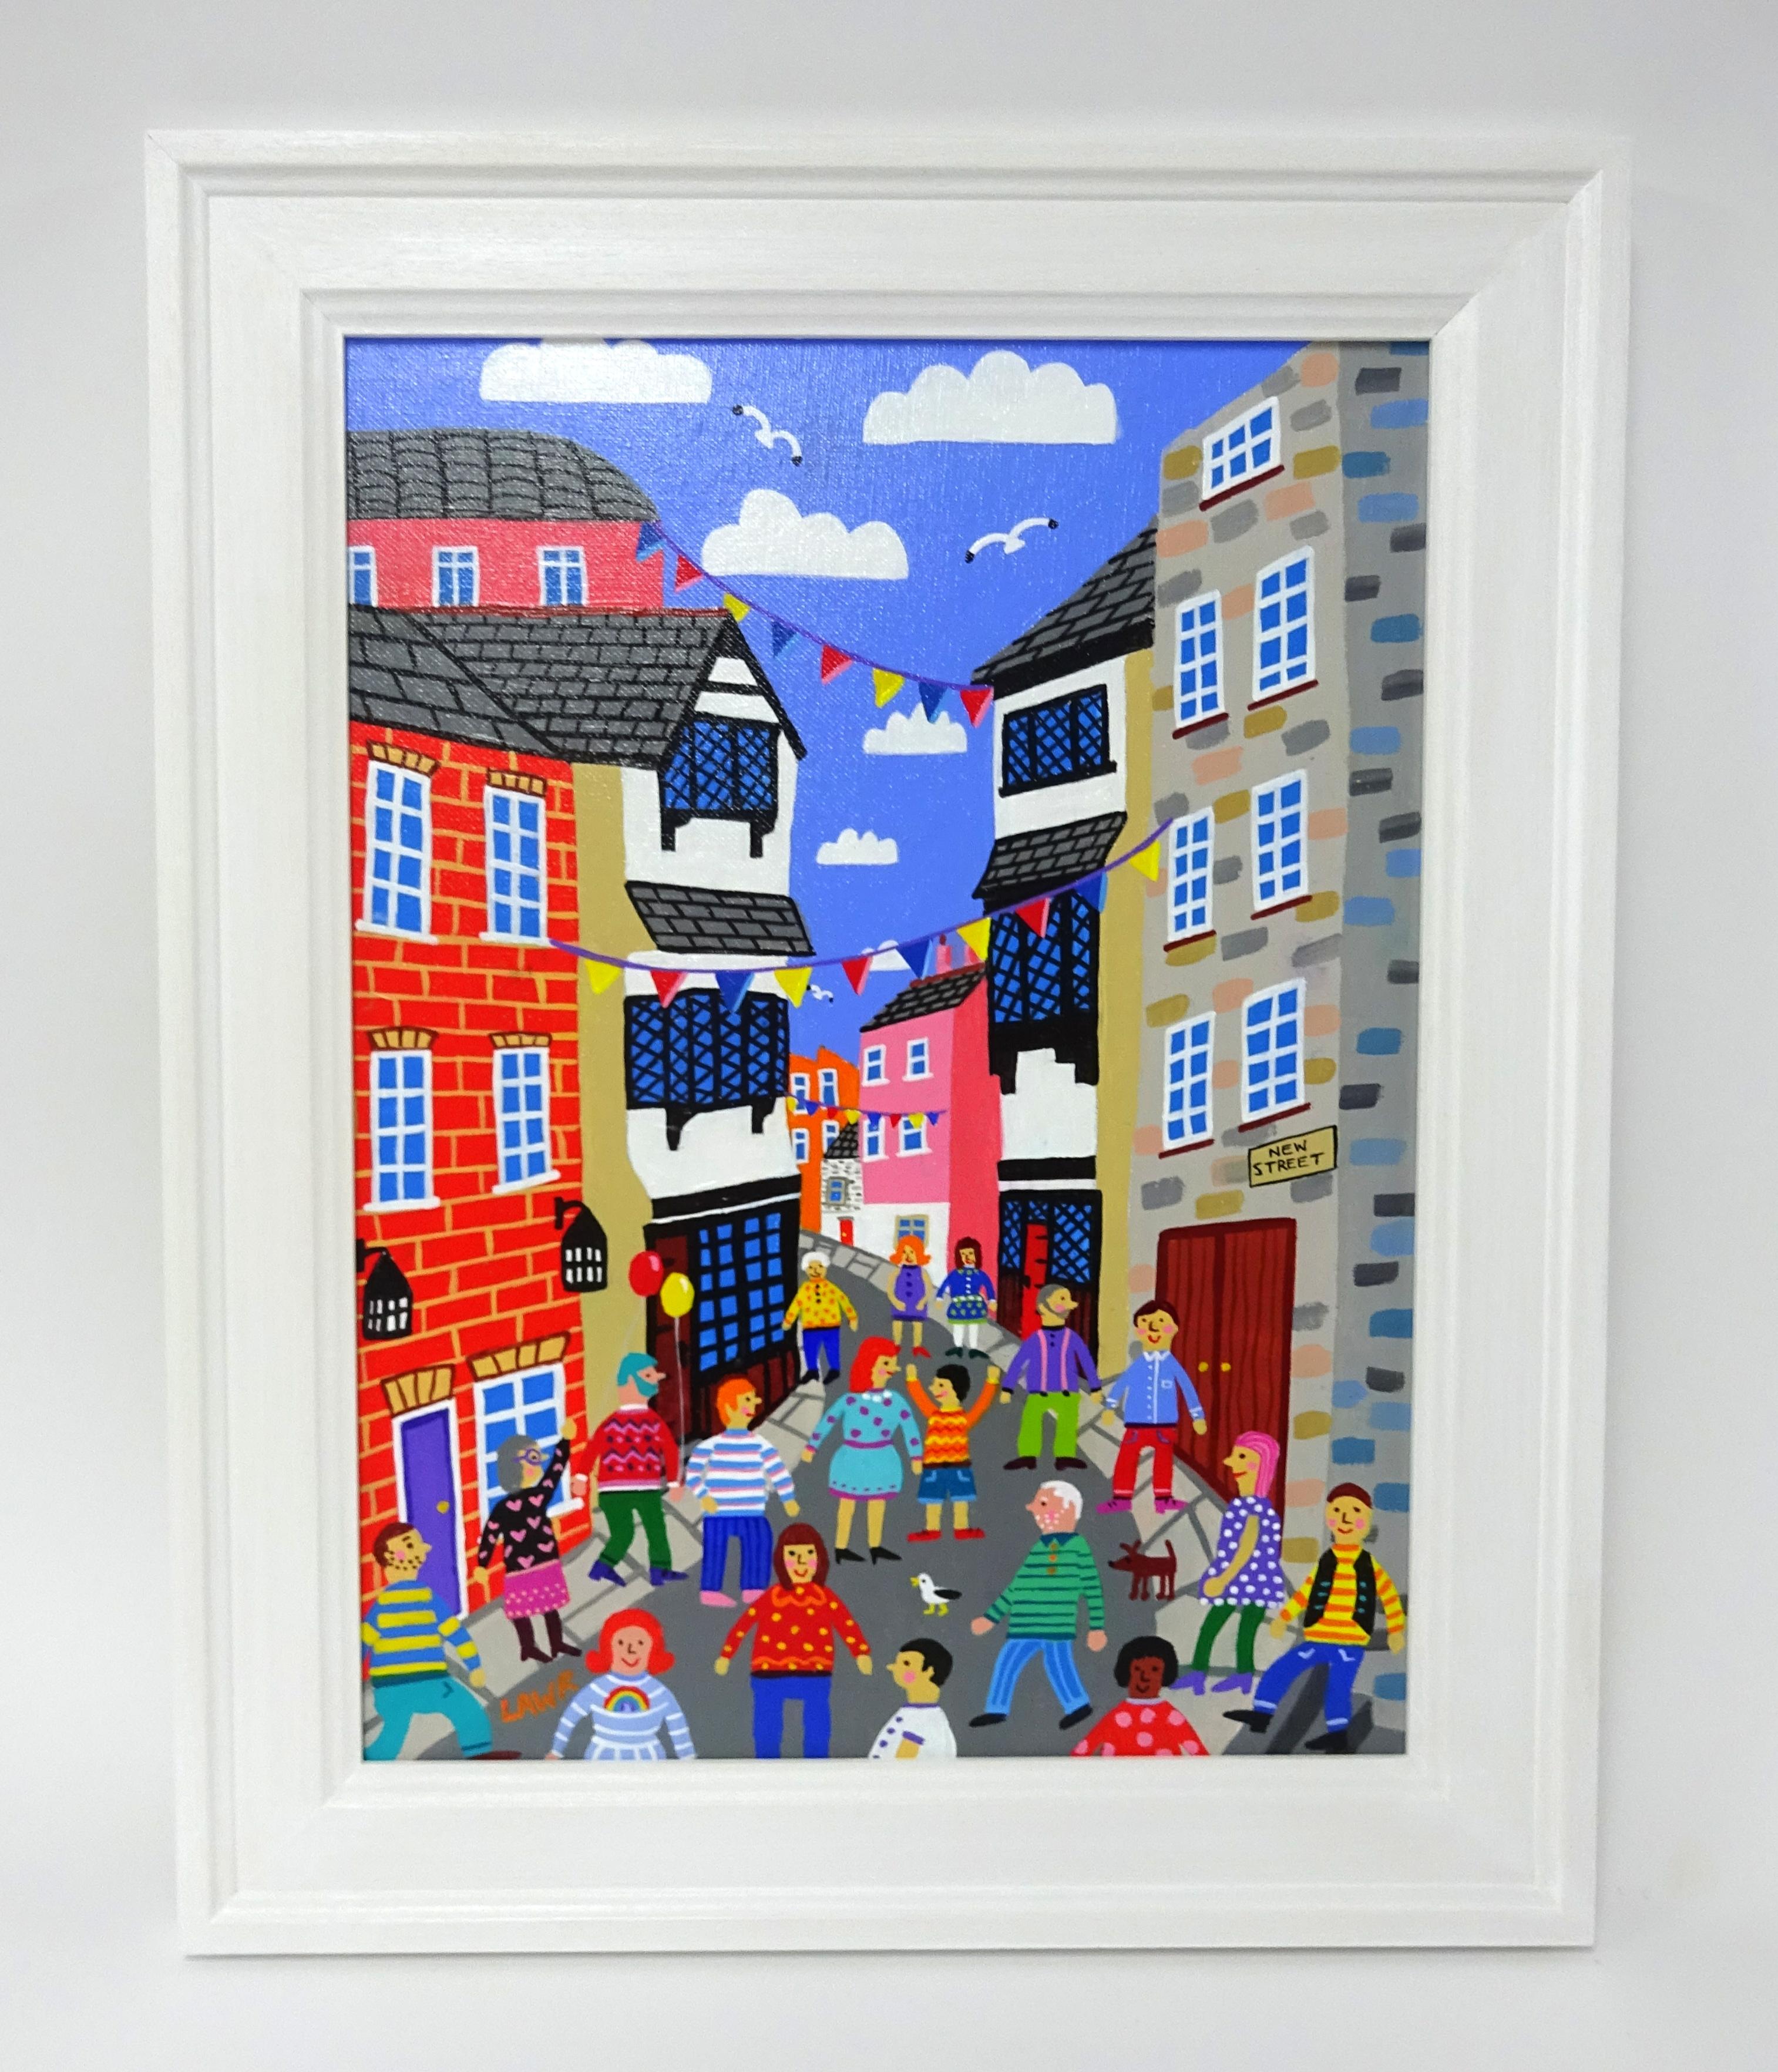 Lot 004 - Arth Lawr, original acrylic on board 'New Street, The Barbican, 2019' signed, 40cm x 30cm, consigned